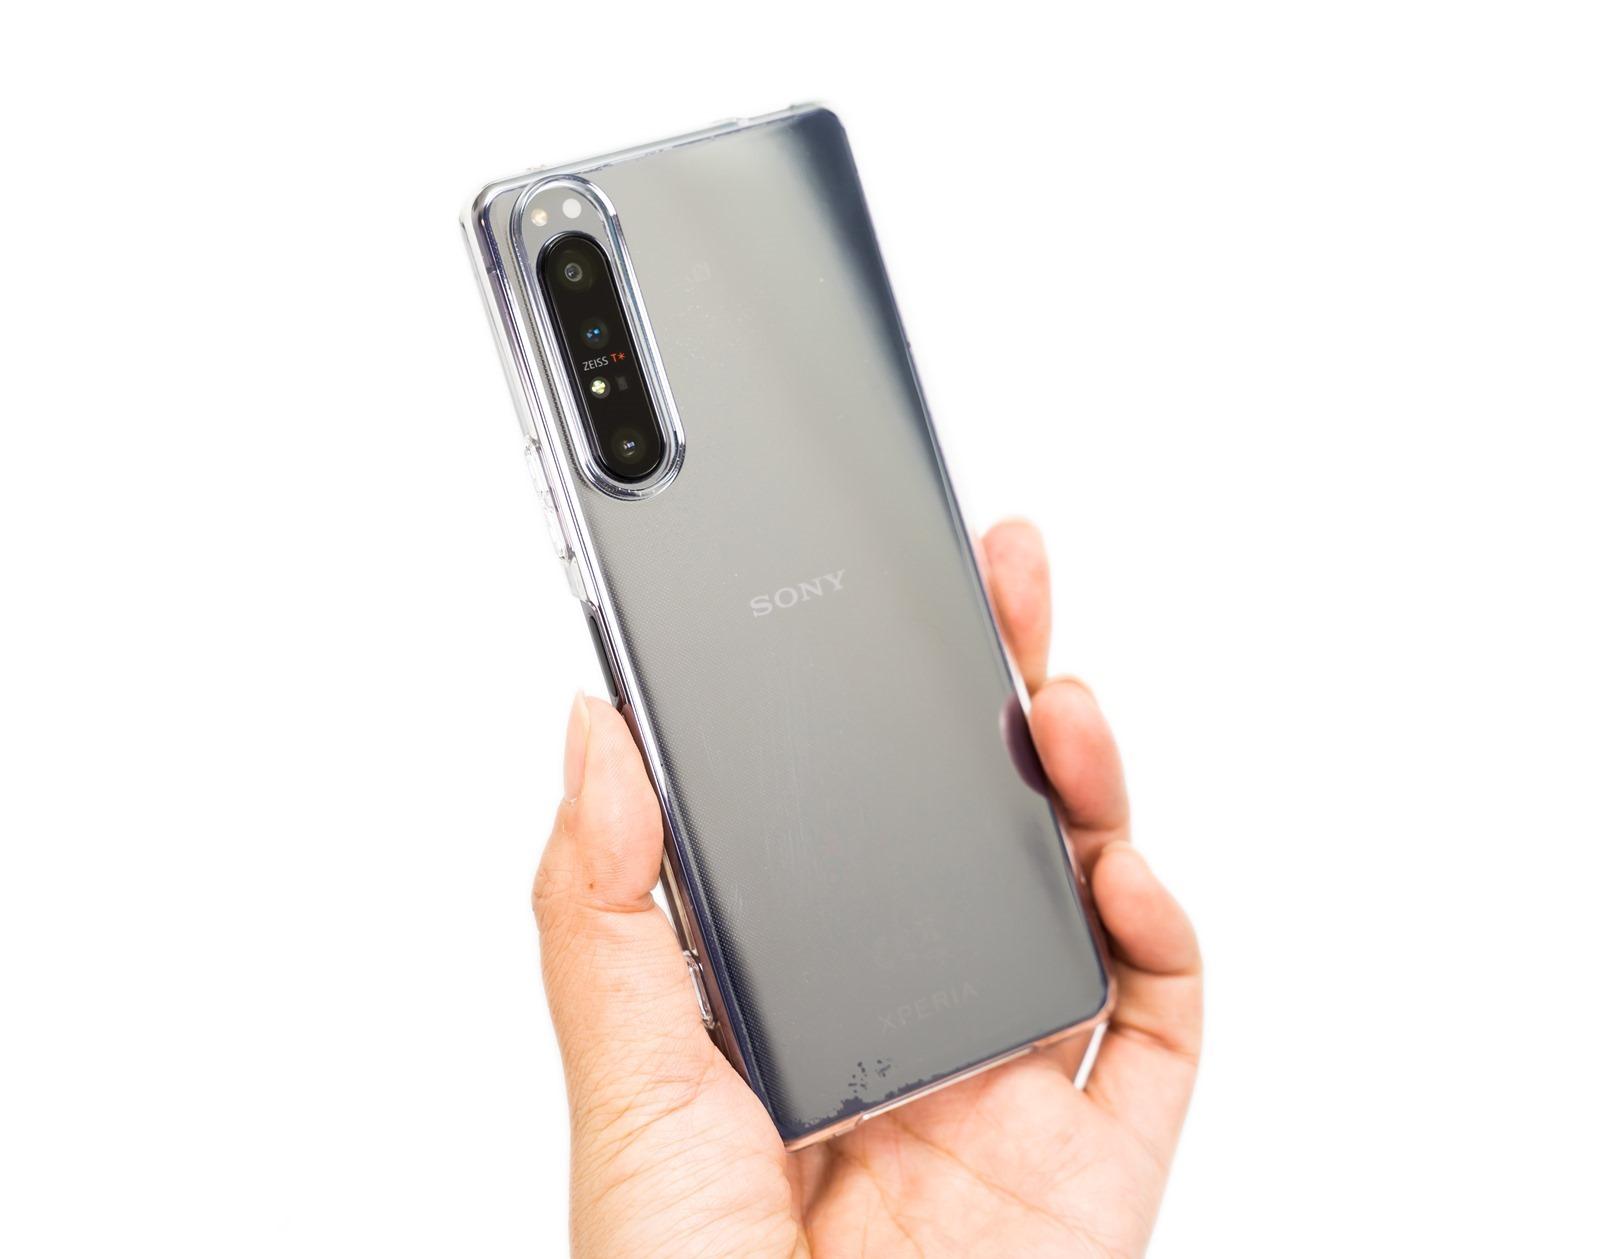 RASTA BANANA 新素材 Tritan 高透明保護殼 for Sony Xperia 1II / 10 II 入手簡單開箱分享 @3C 達人廖阿輝